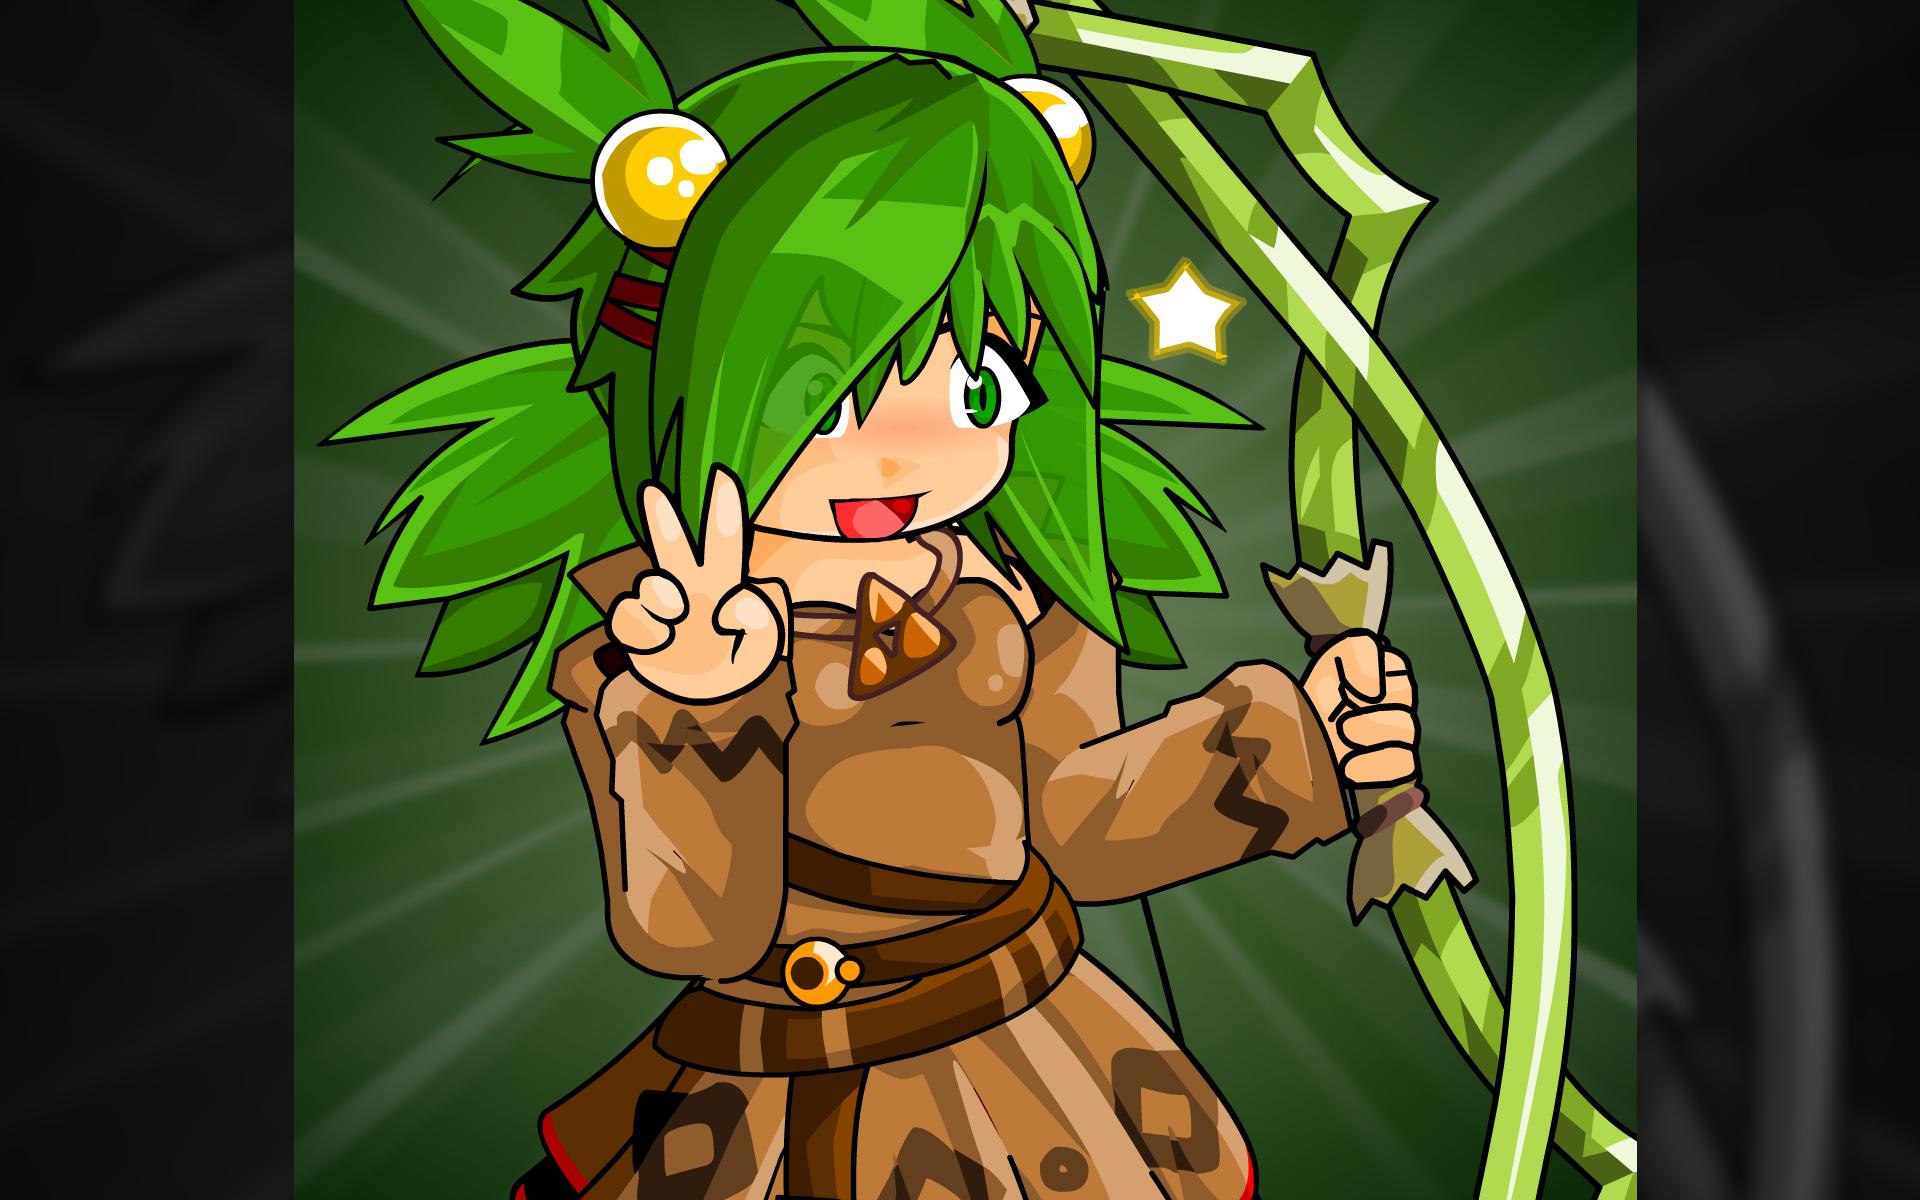 https://vignette4.wikia.nocookie.net/steamtradingcards/images/0/02/Epic_Battle_Fantasy_4_Artwork_1.jpg/revision/latest?cb=20140419040306